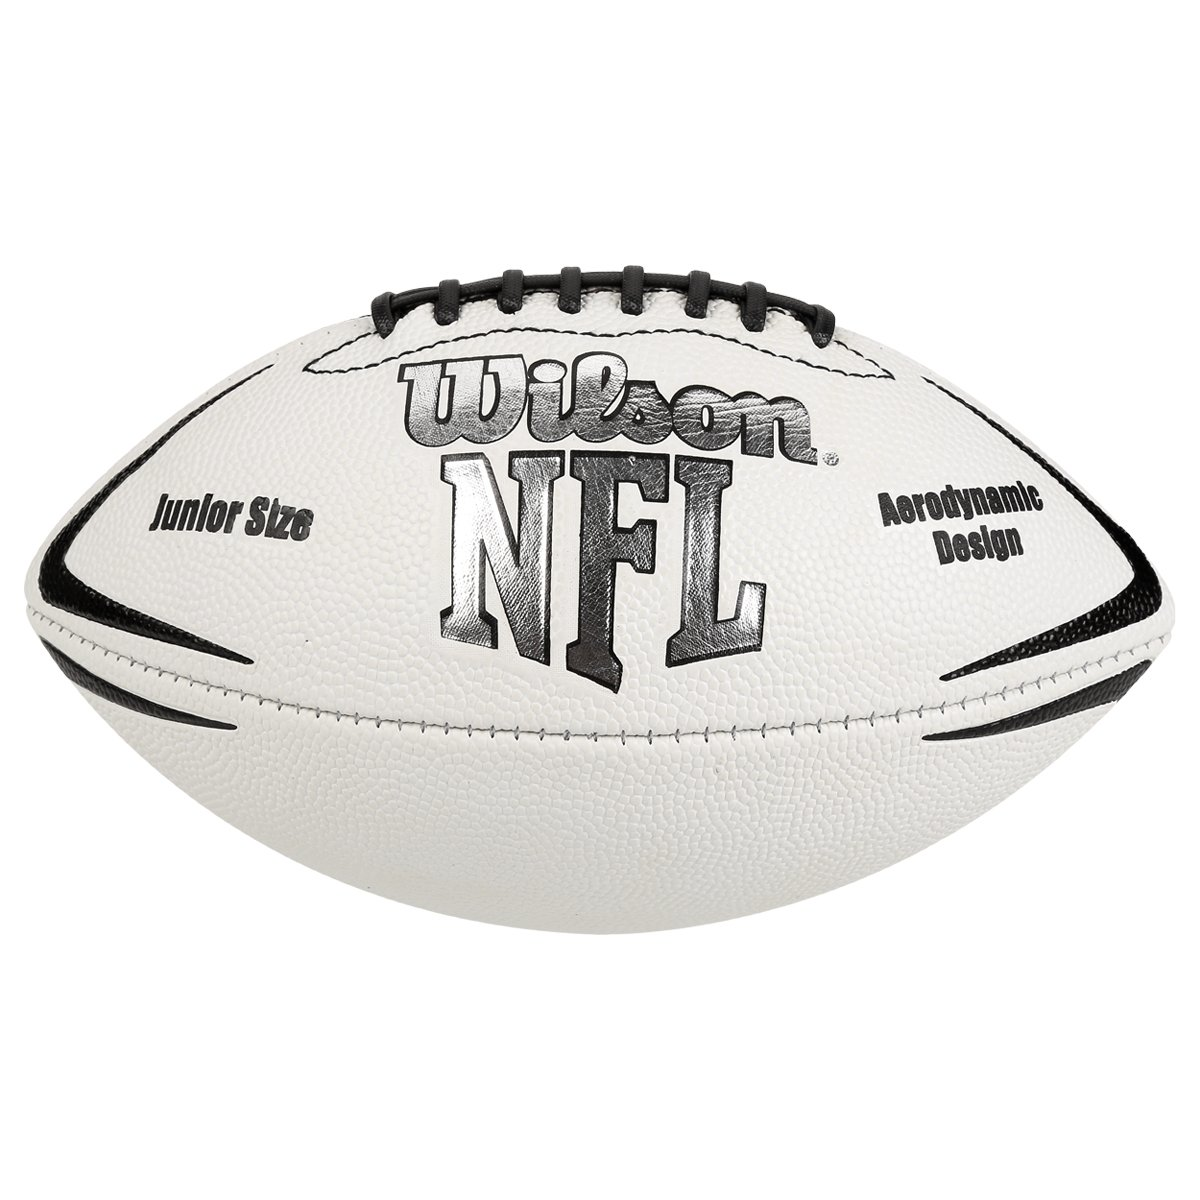 Shopping Smiles - Bola Futebol Americano Wilson NFL Avenger Júnior a6576f4f7eb20